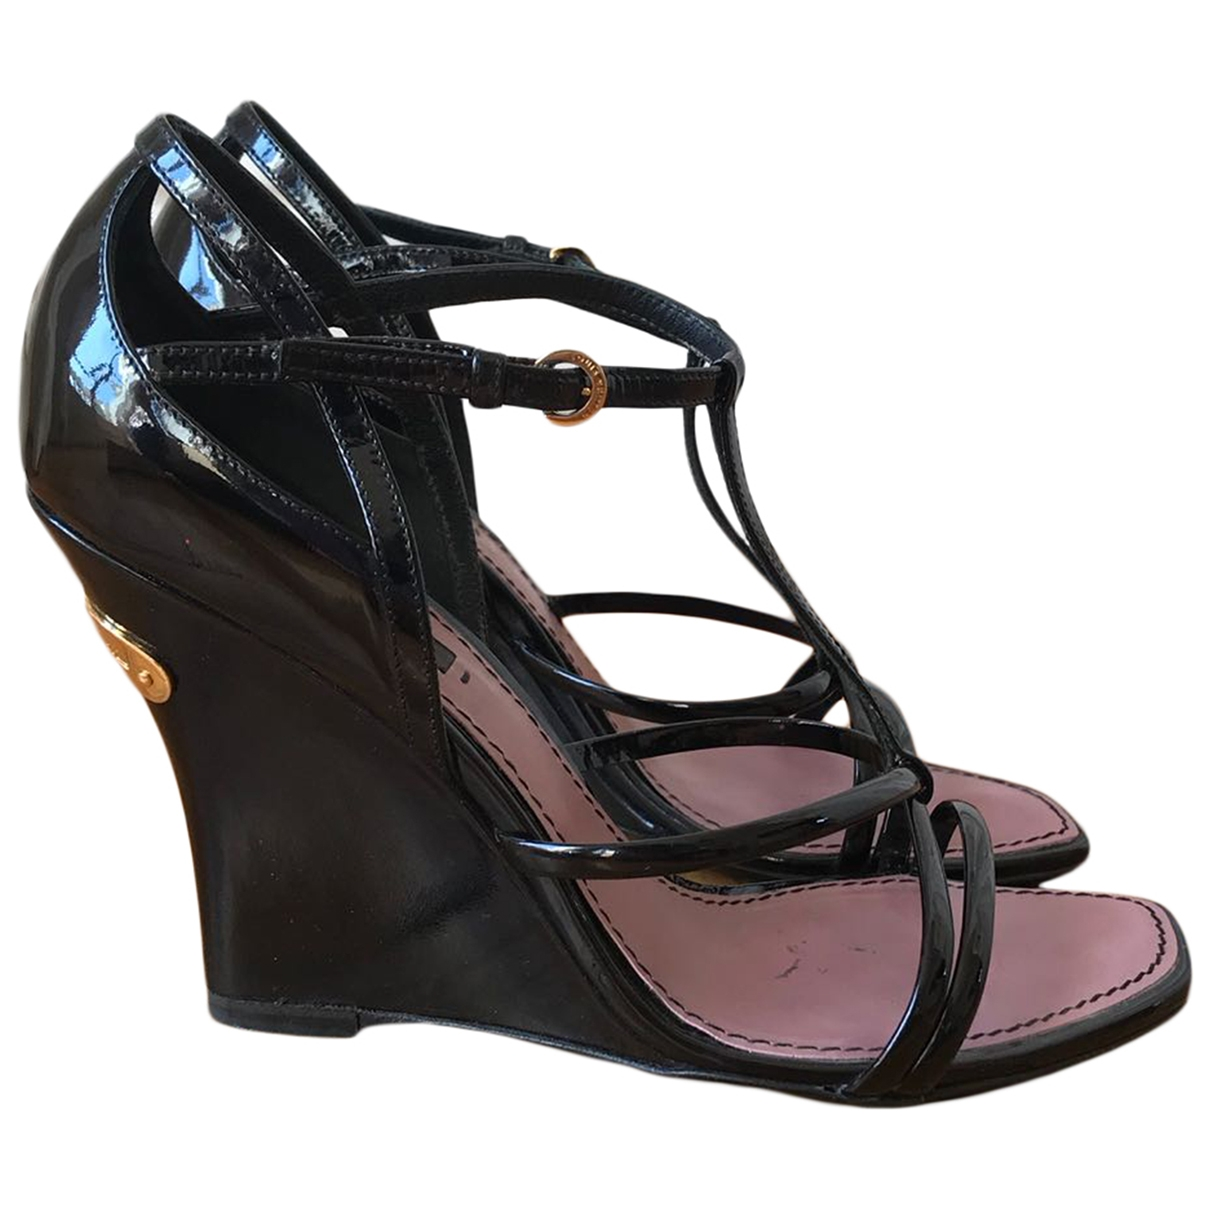 Sandalias de Charol Louis Vuitton